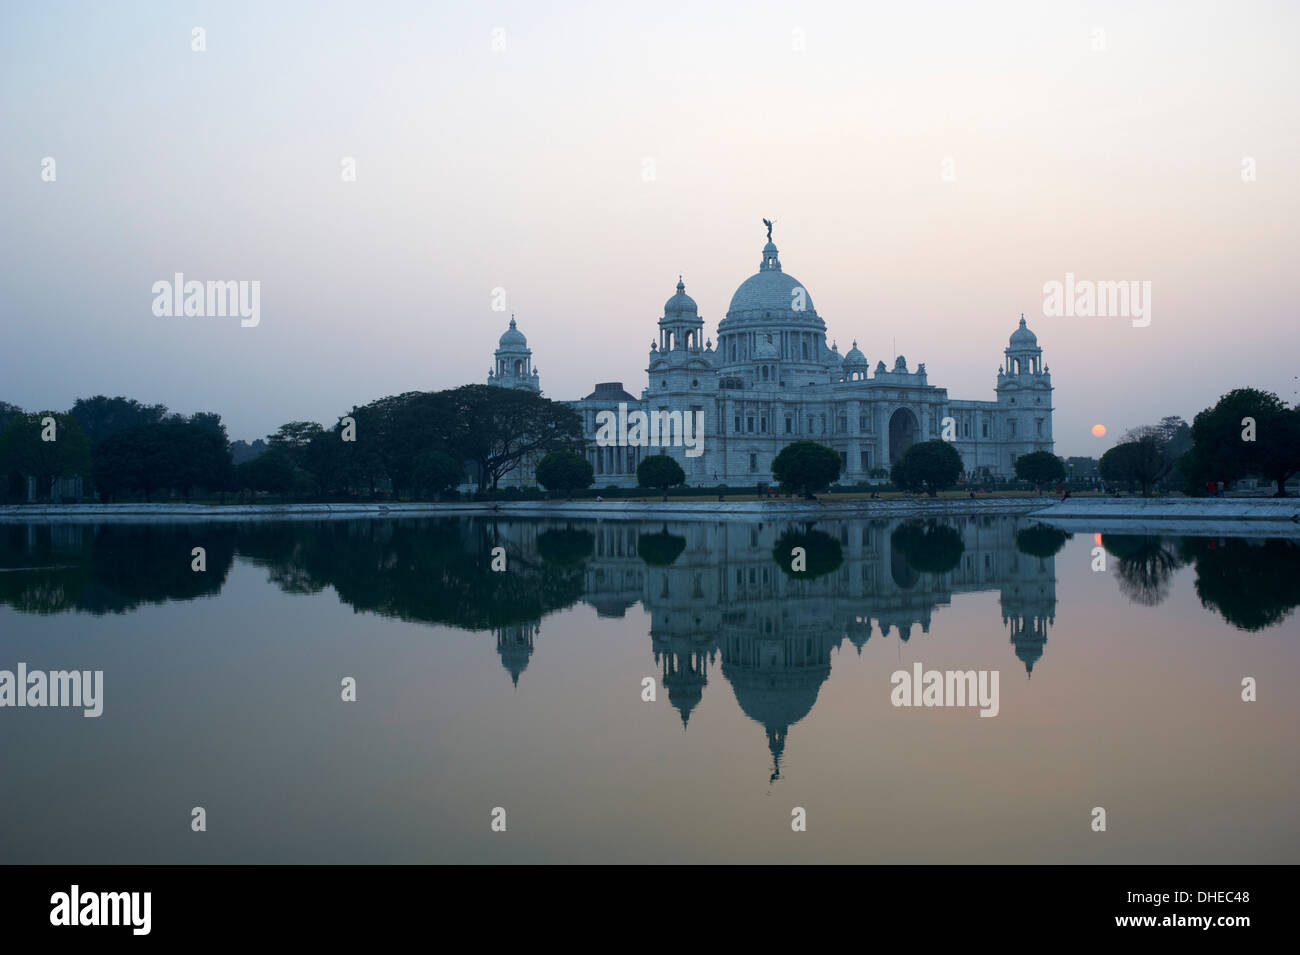 Victoria Memorial, Chowringhee, Kolkata (Calcutta), West Bengal, India, Asia Stock Photo